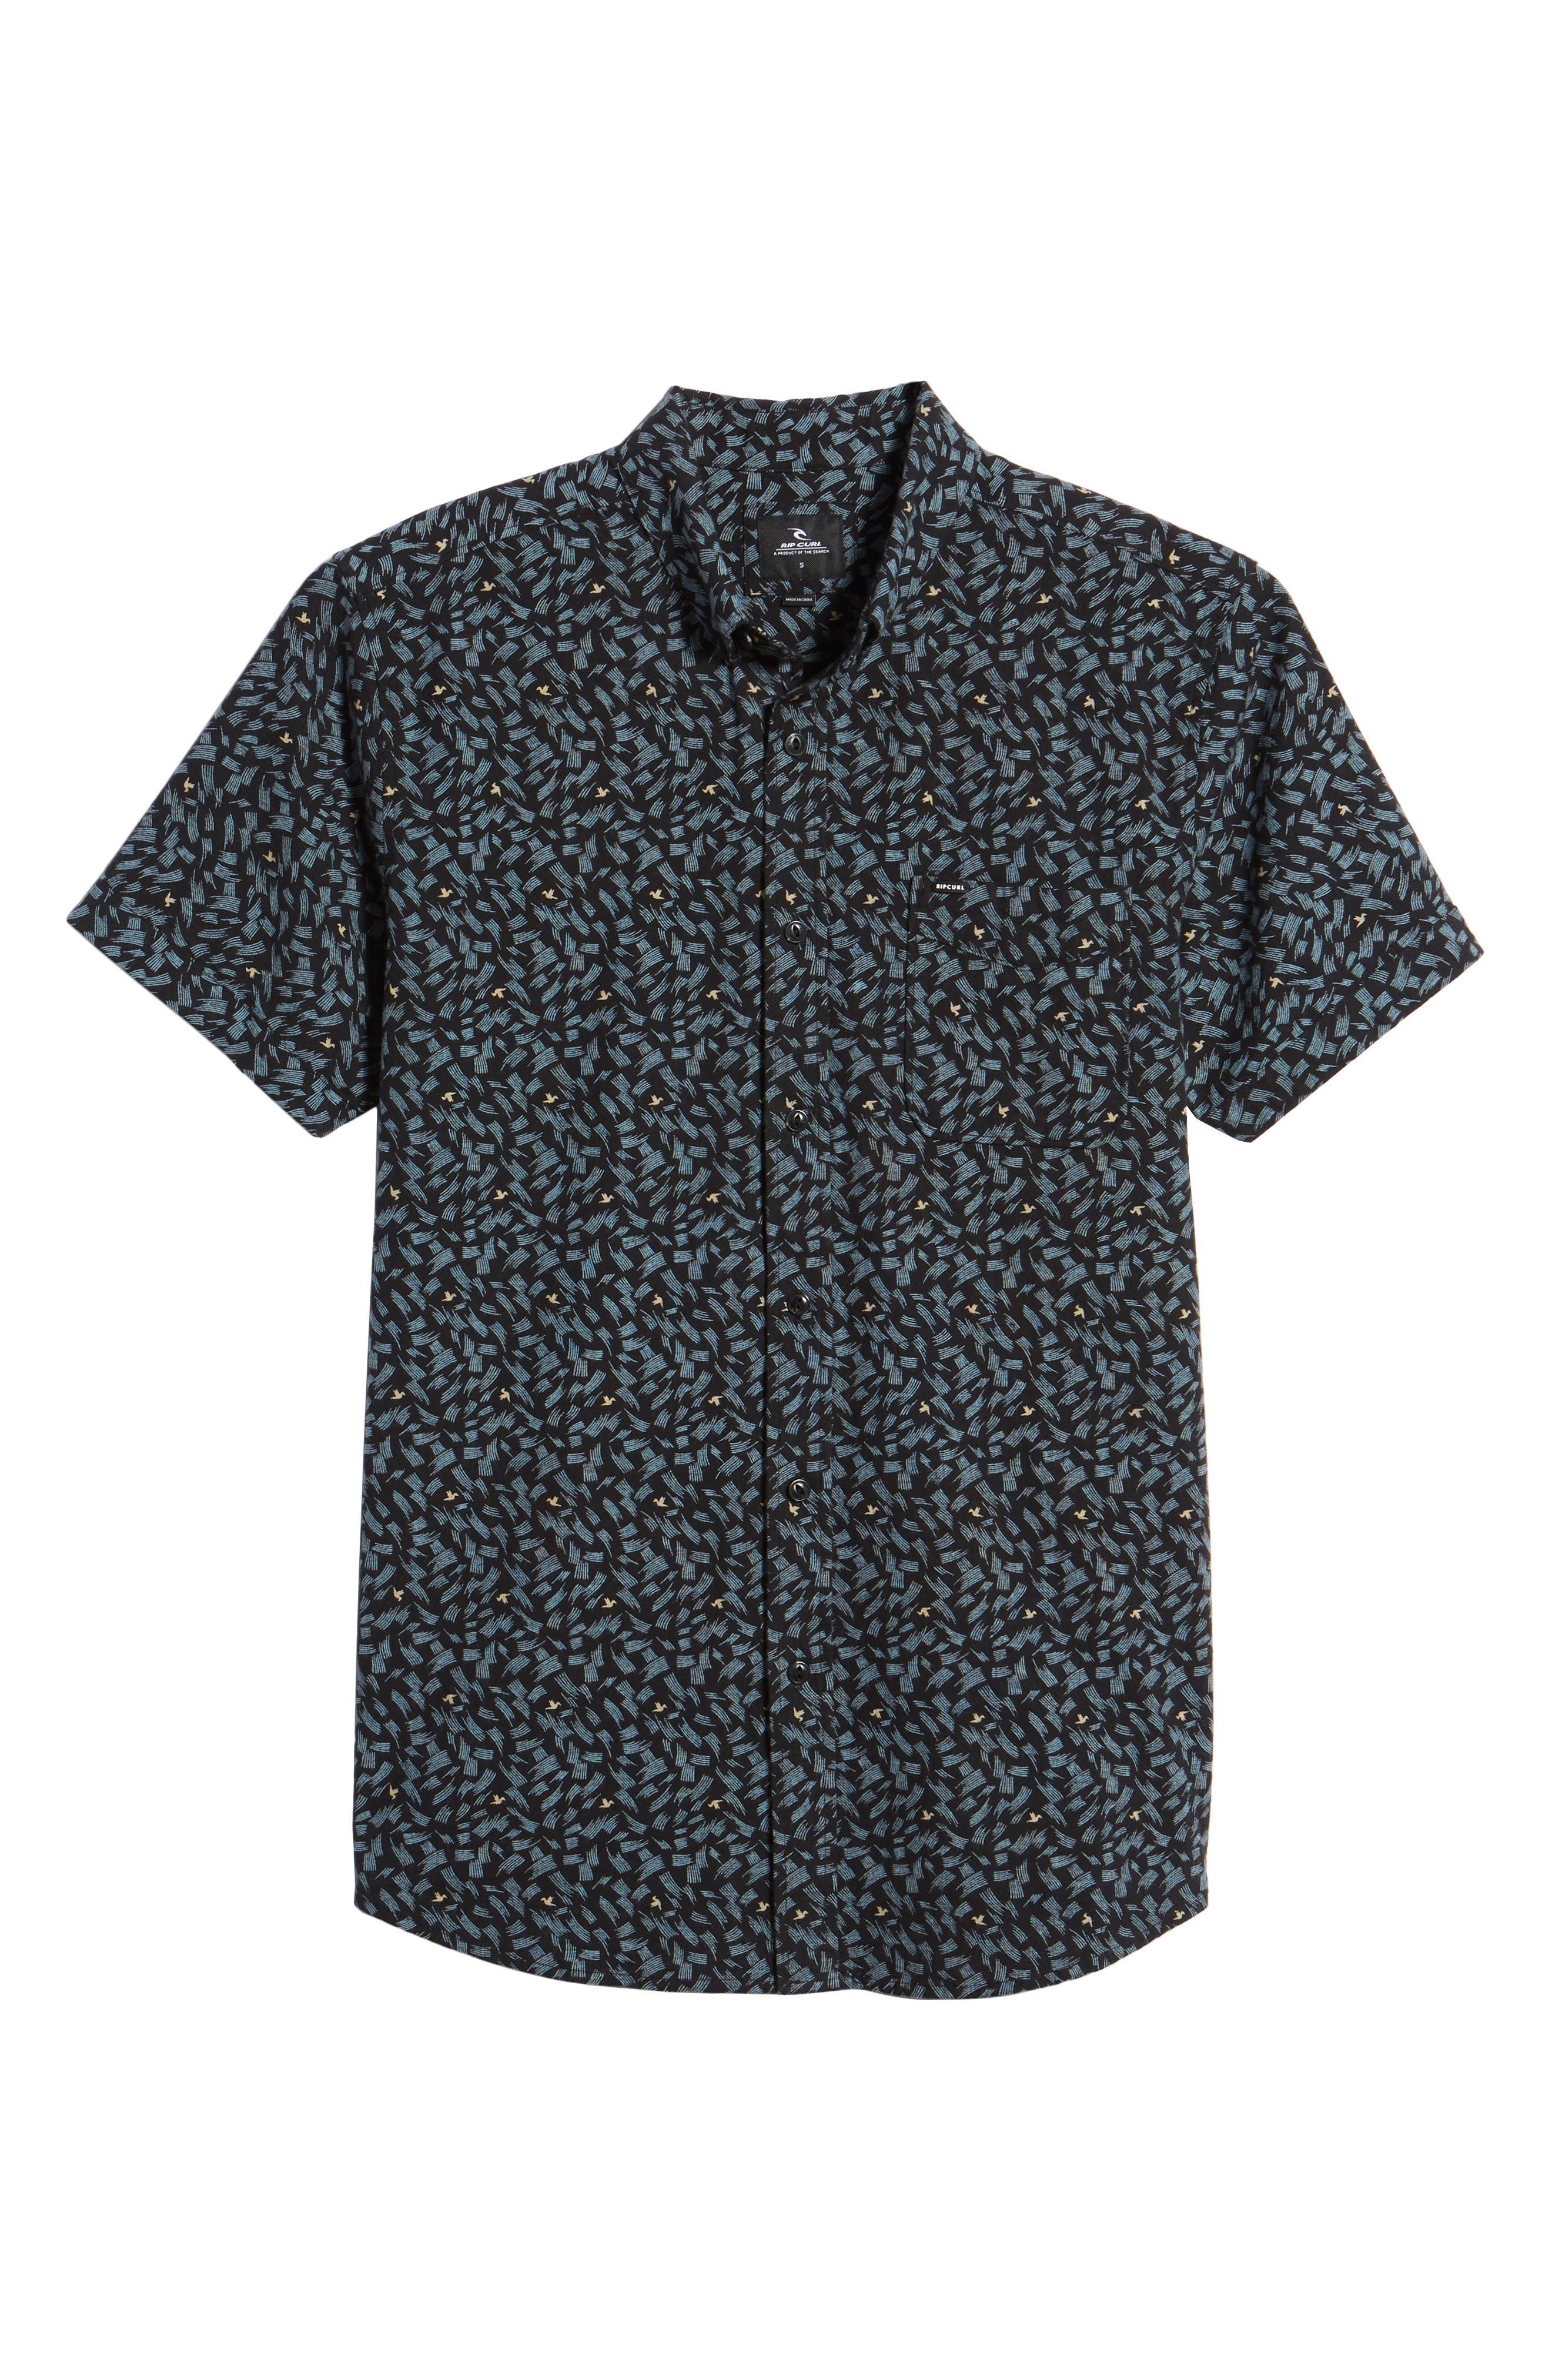 Northern Short Sleeve Shirt,                             Alternate thumbnail 6, color,                             001